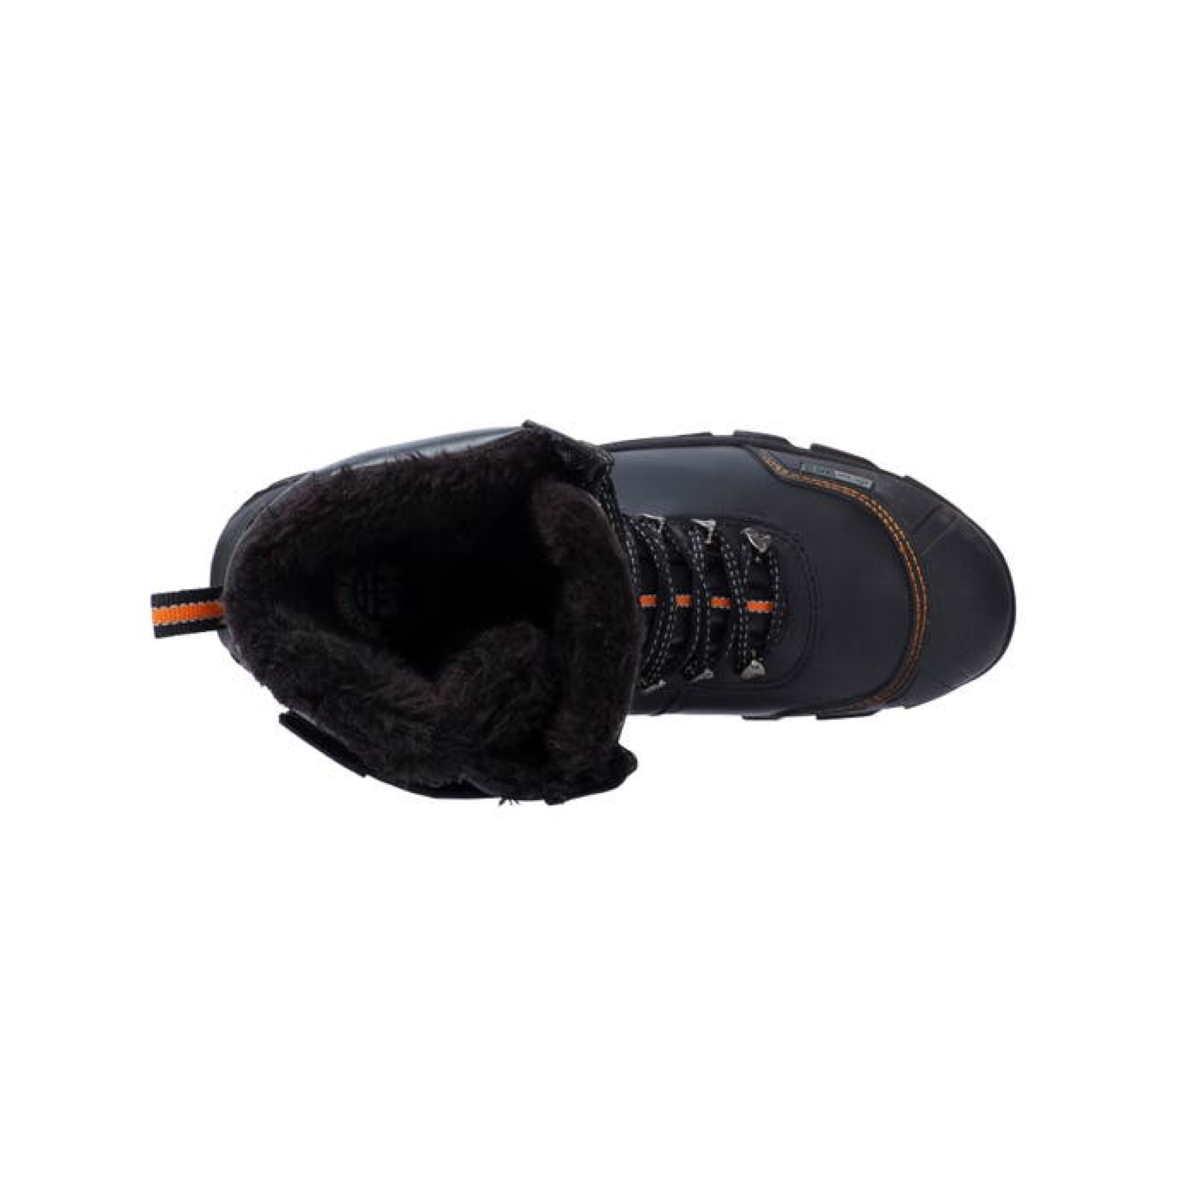 SF7830 Helly Hansen Chelsea Waterproof Winter Boot Top